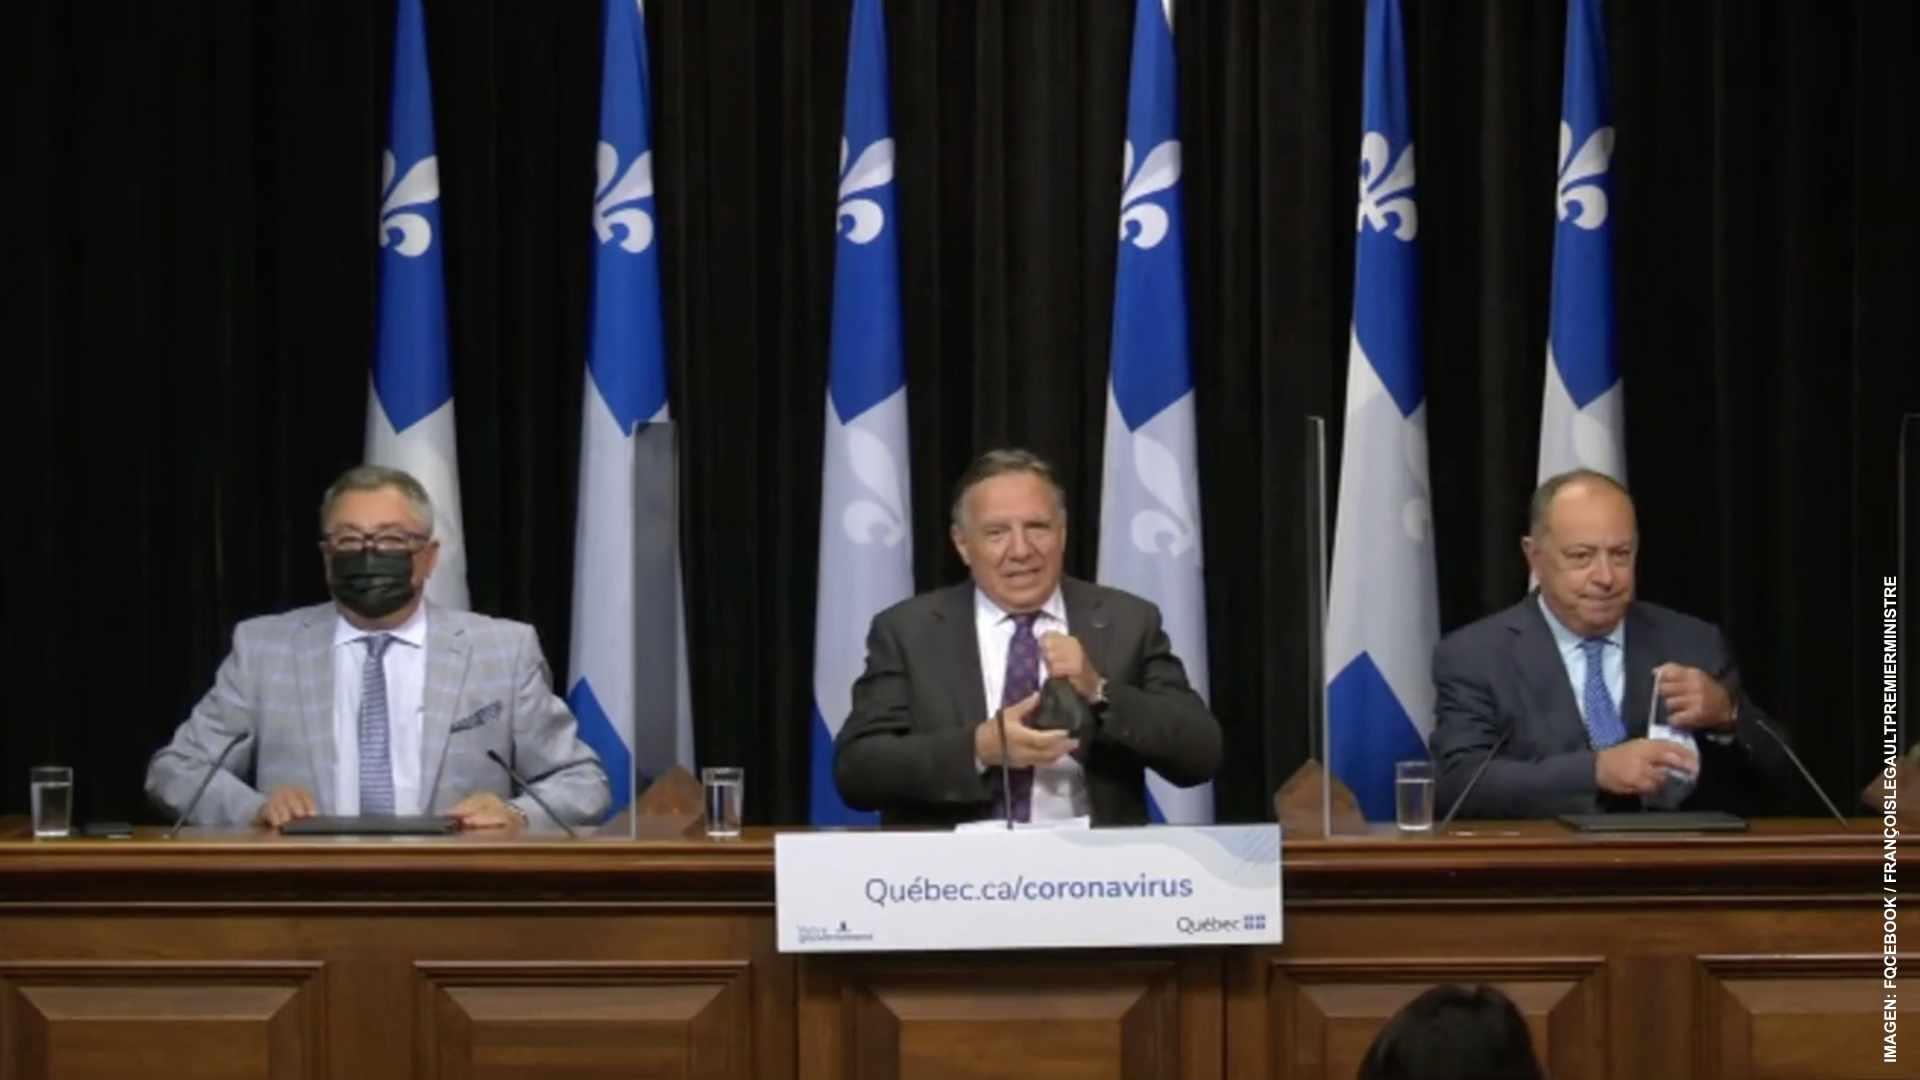 Vacuna obligatoria para el sector salud de Quebec